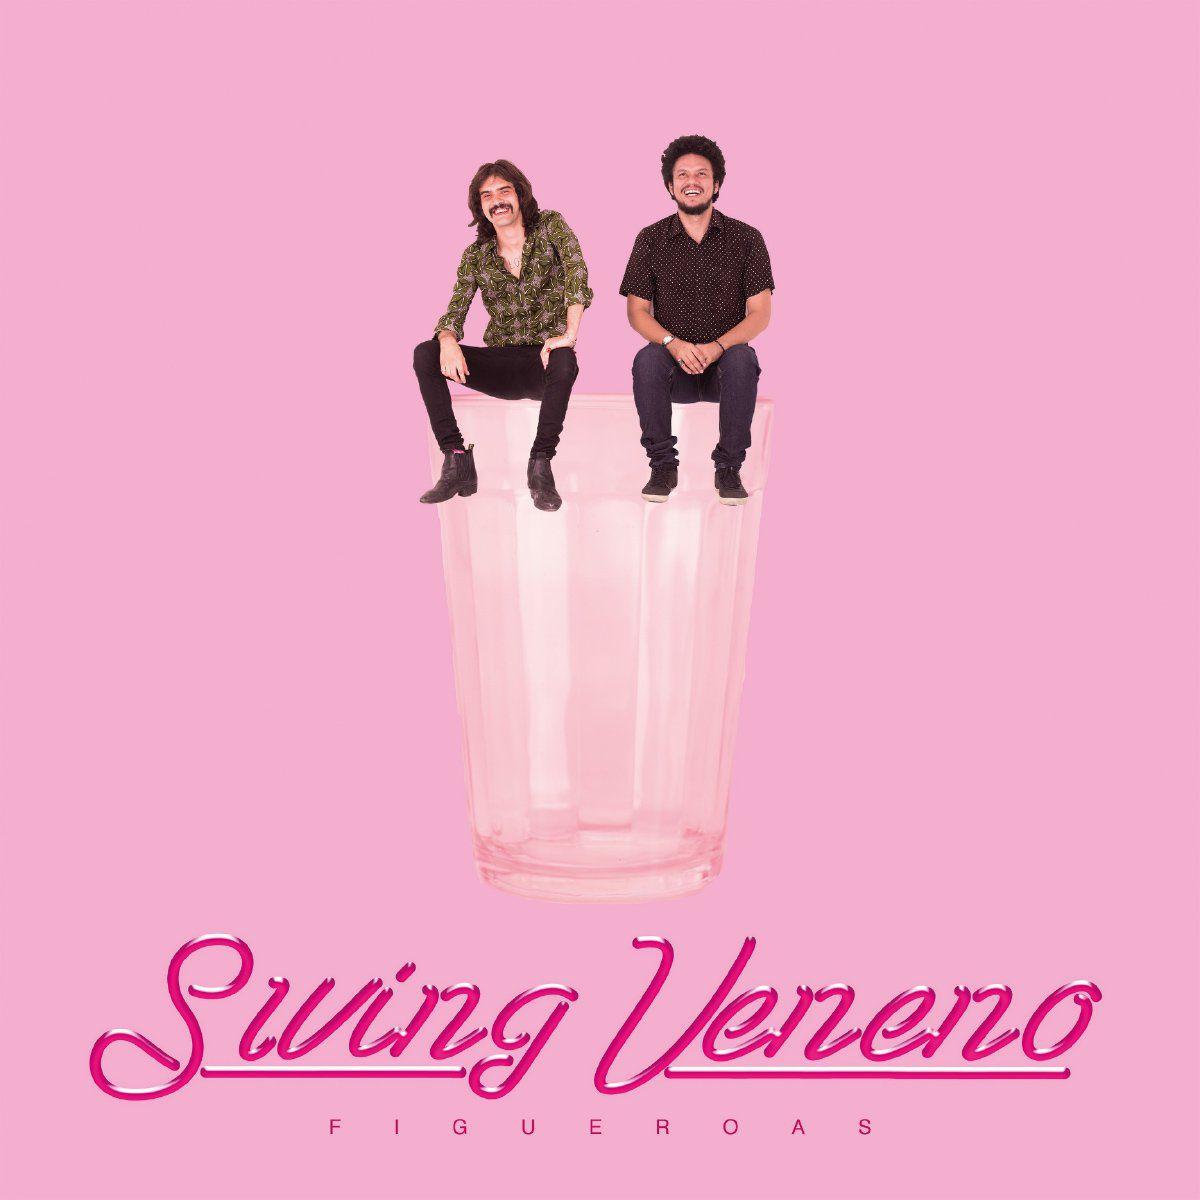 LP Figueroas Swing Veneno  - bandUP Store Marketplace